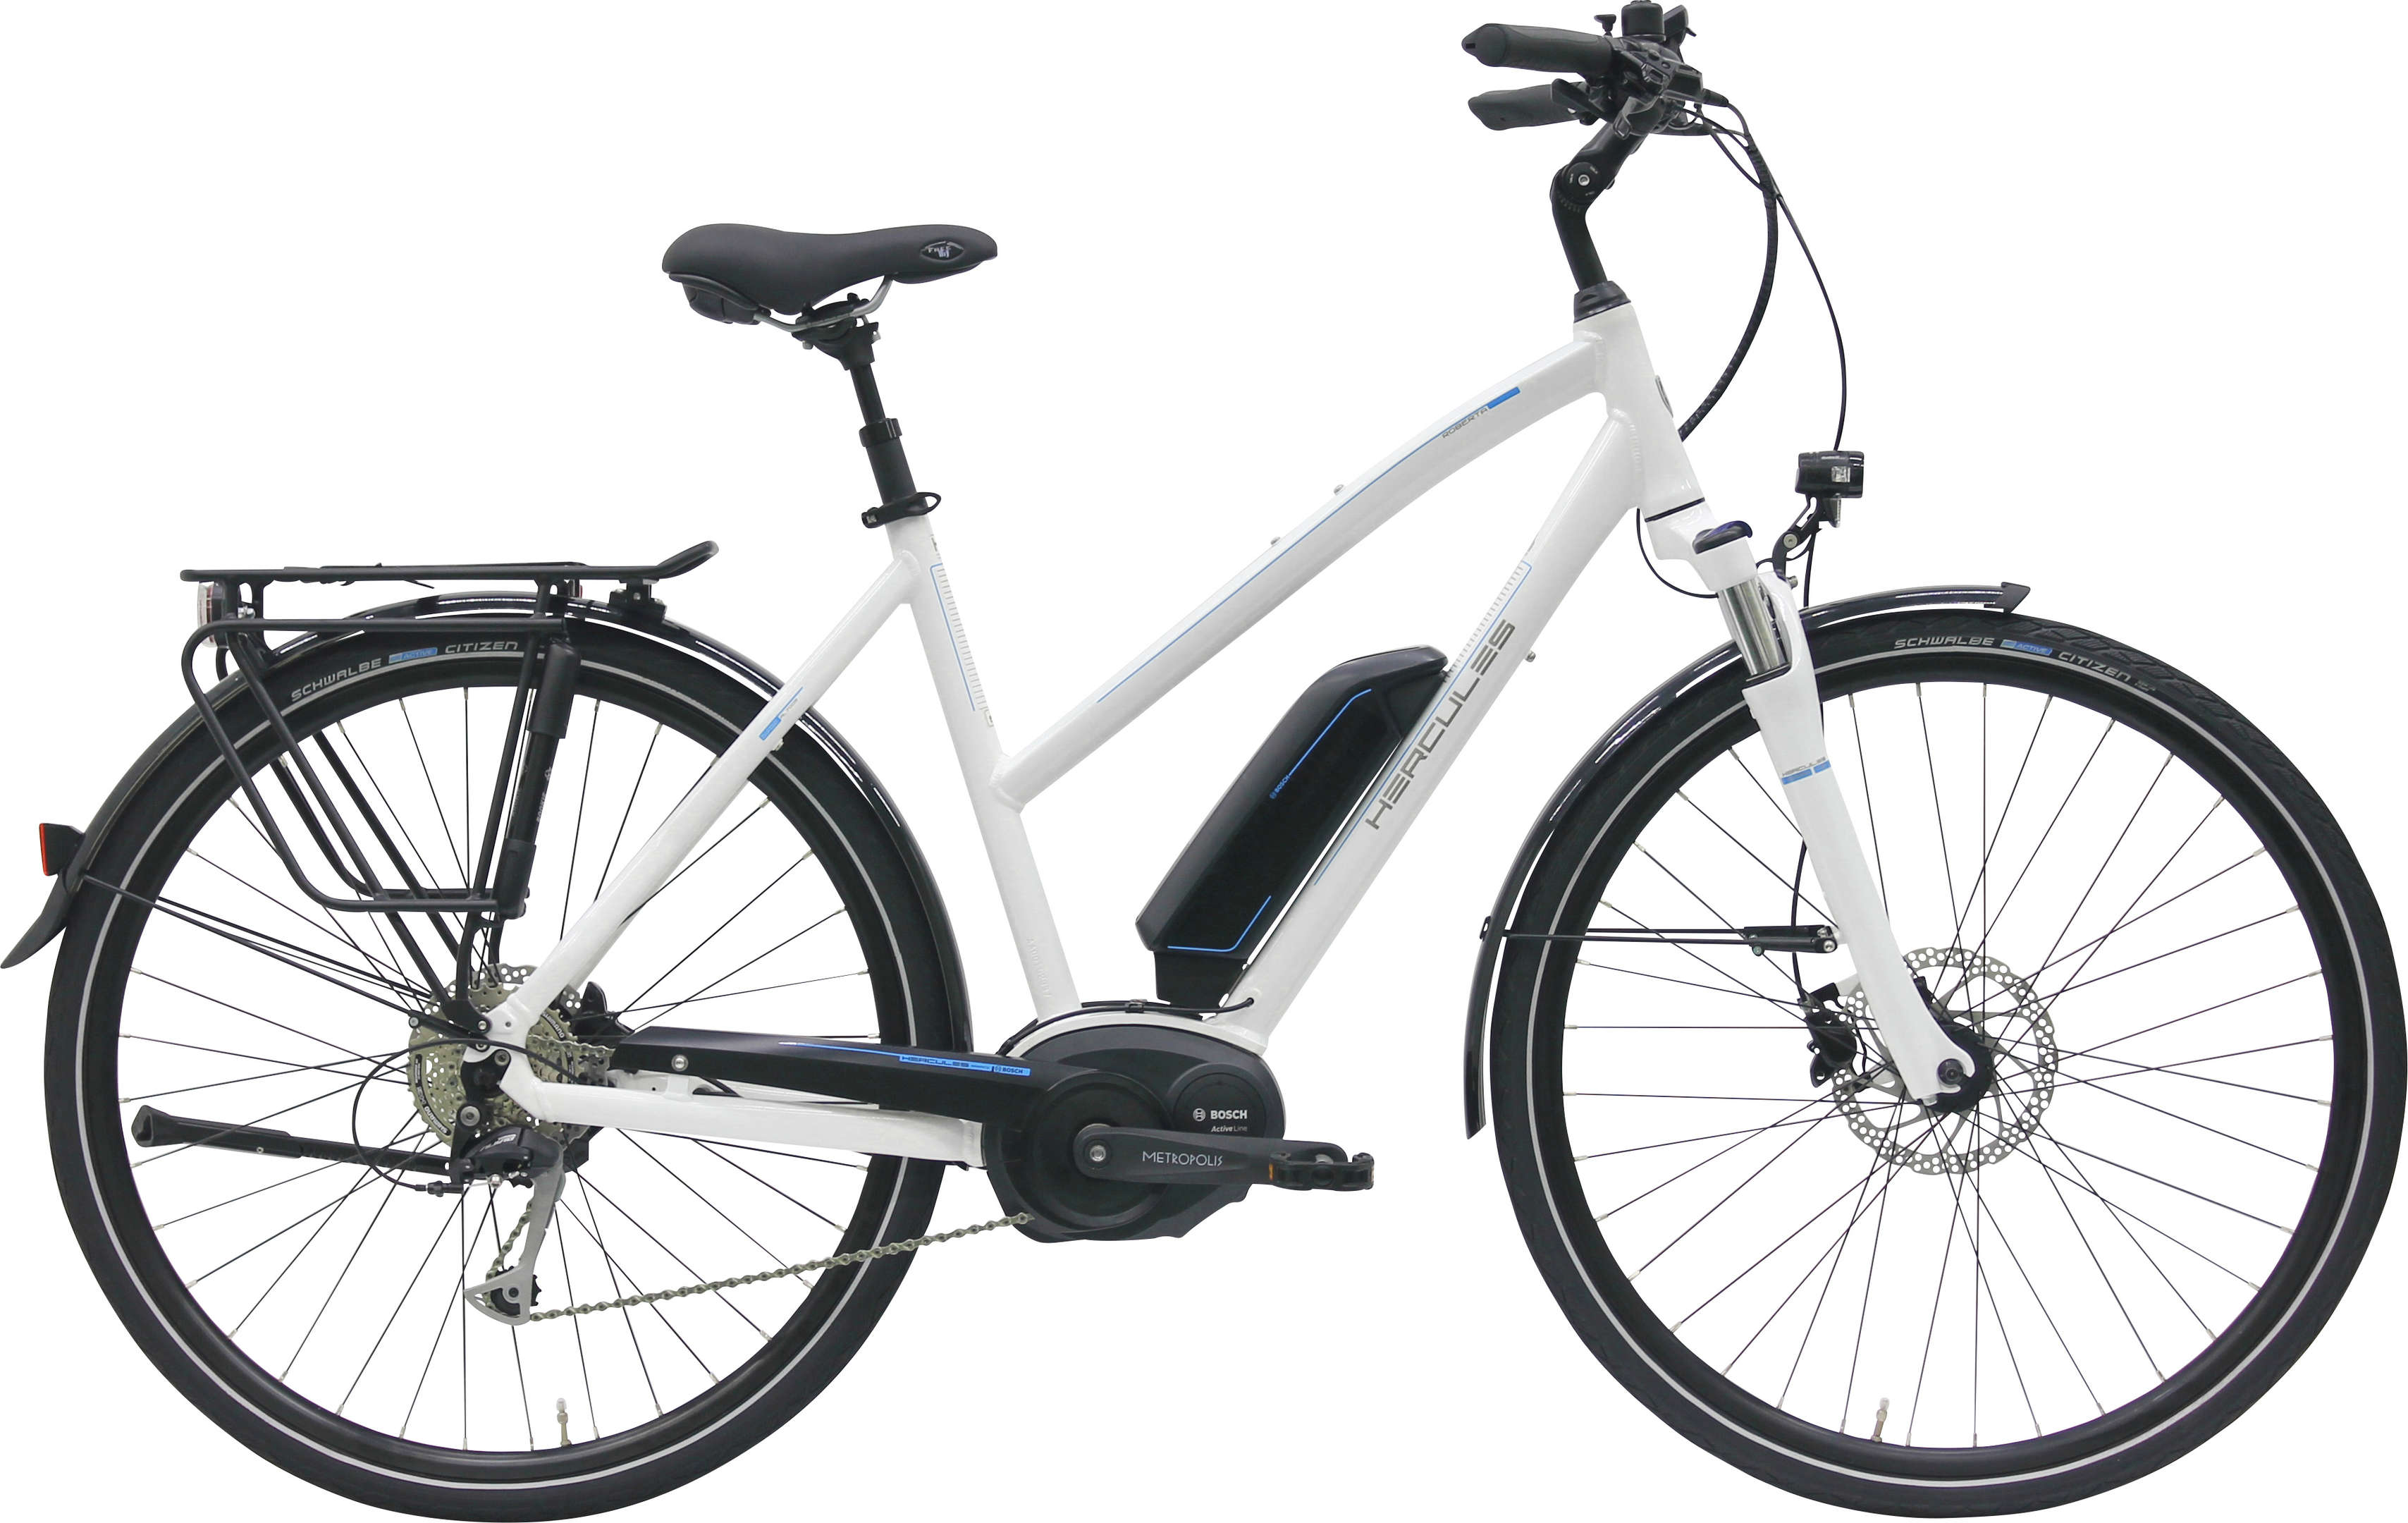 hercules e bike robert a 8 eurorad bikeleasingeurorad. Black Bedroom Furniture Sets. Home Design Ideas